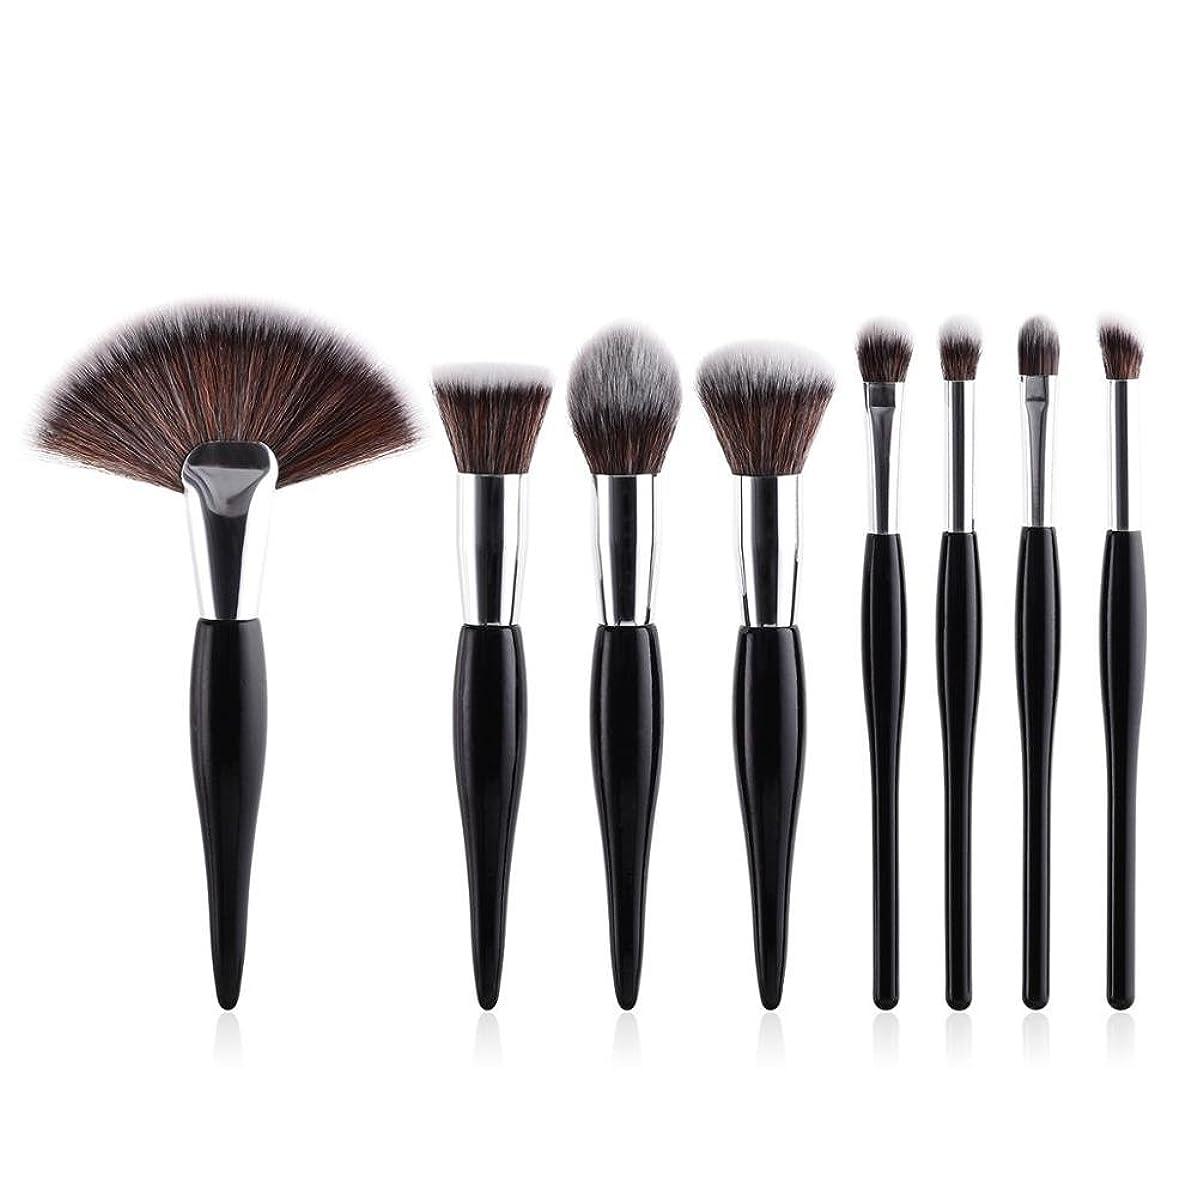 Makeup Brush - 8pcs Professional Makeup Brushes Set Powder Blush Foundation Eyeshadow Make Up Fan Brushes Cosmetic Kwasten Sets